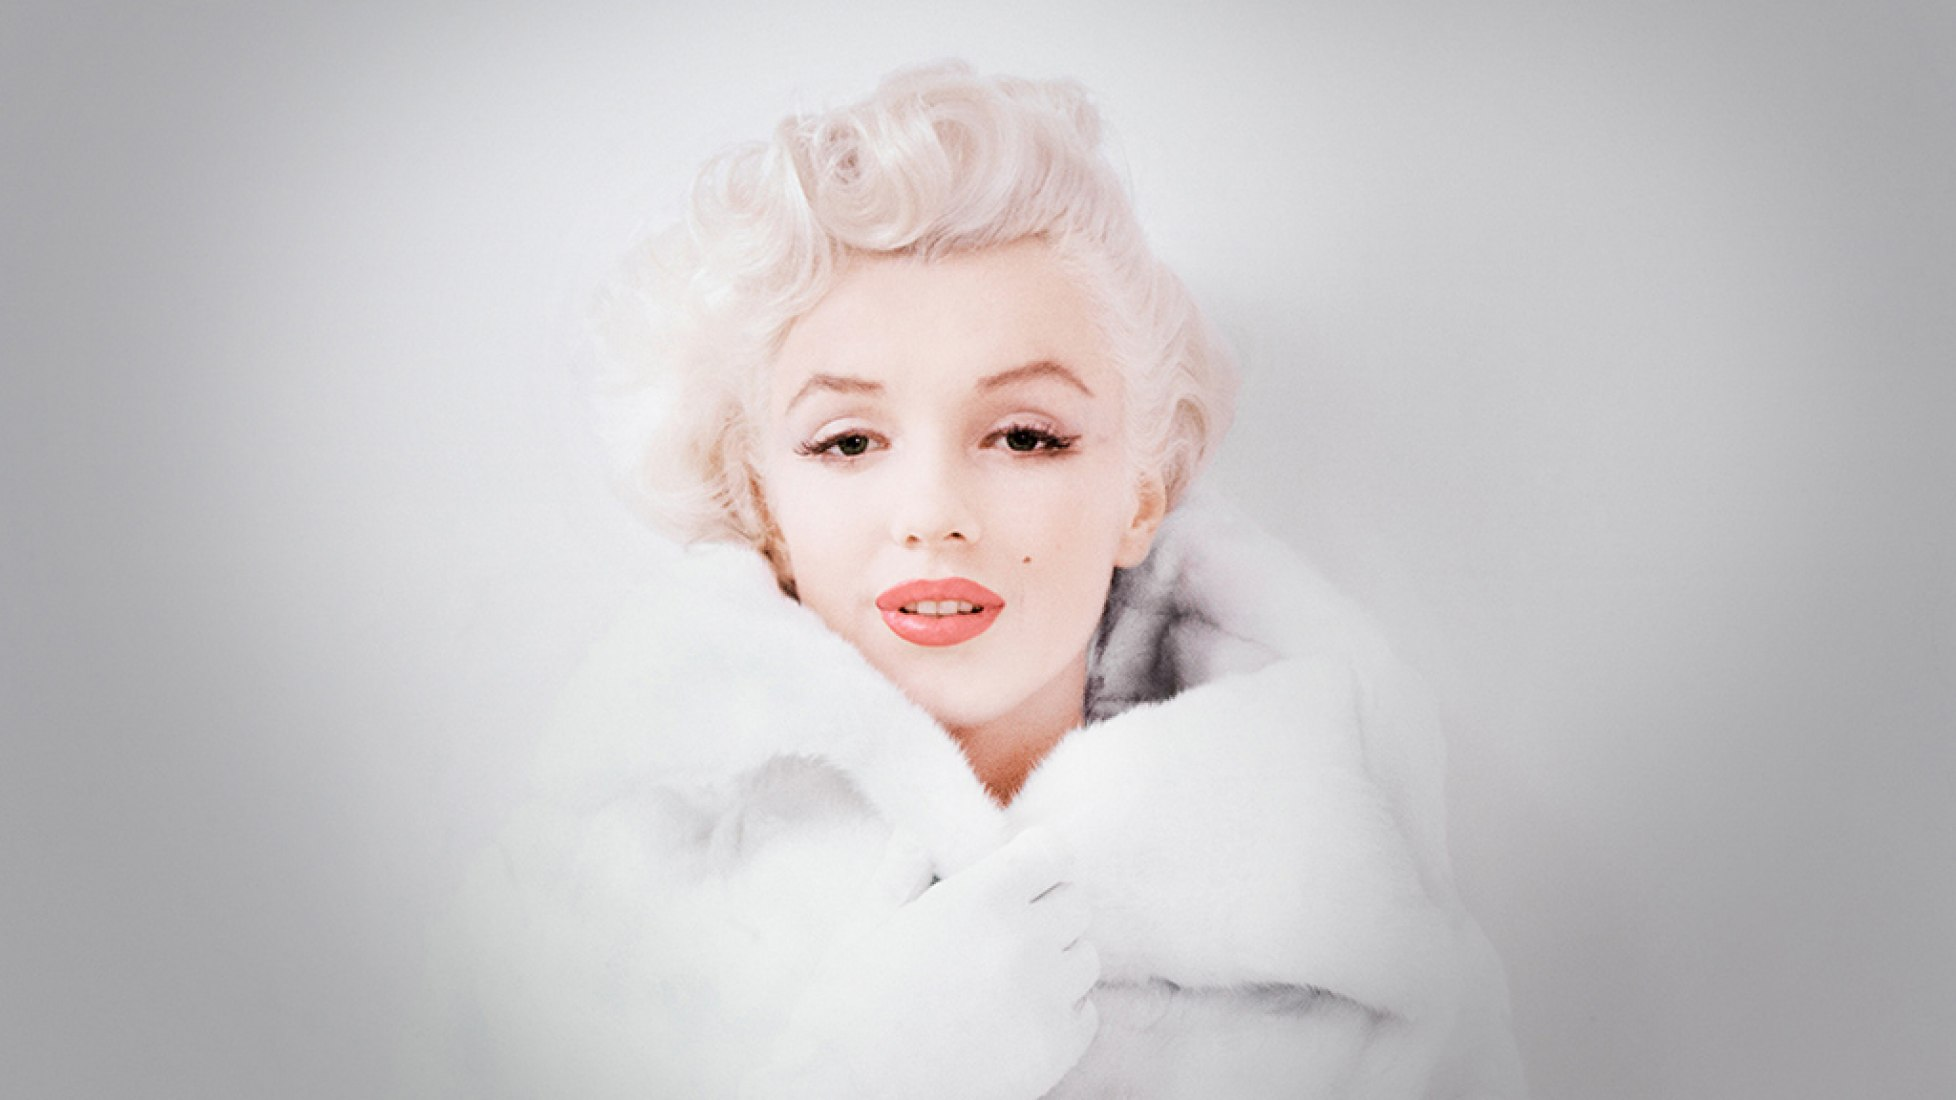 Love, Marilyn Documentary Film Trailer (2013). | The